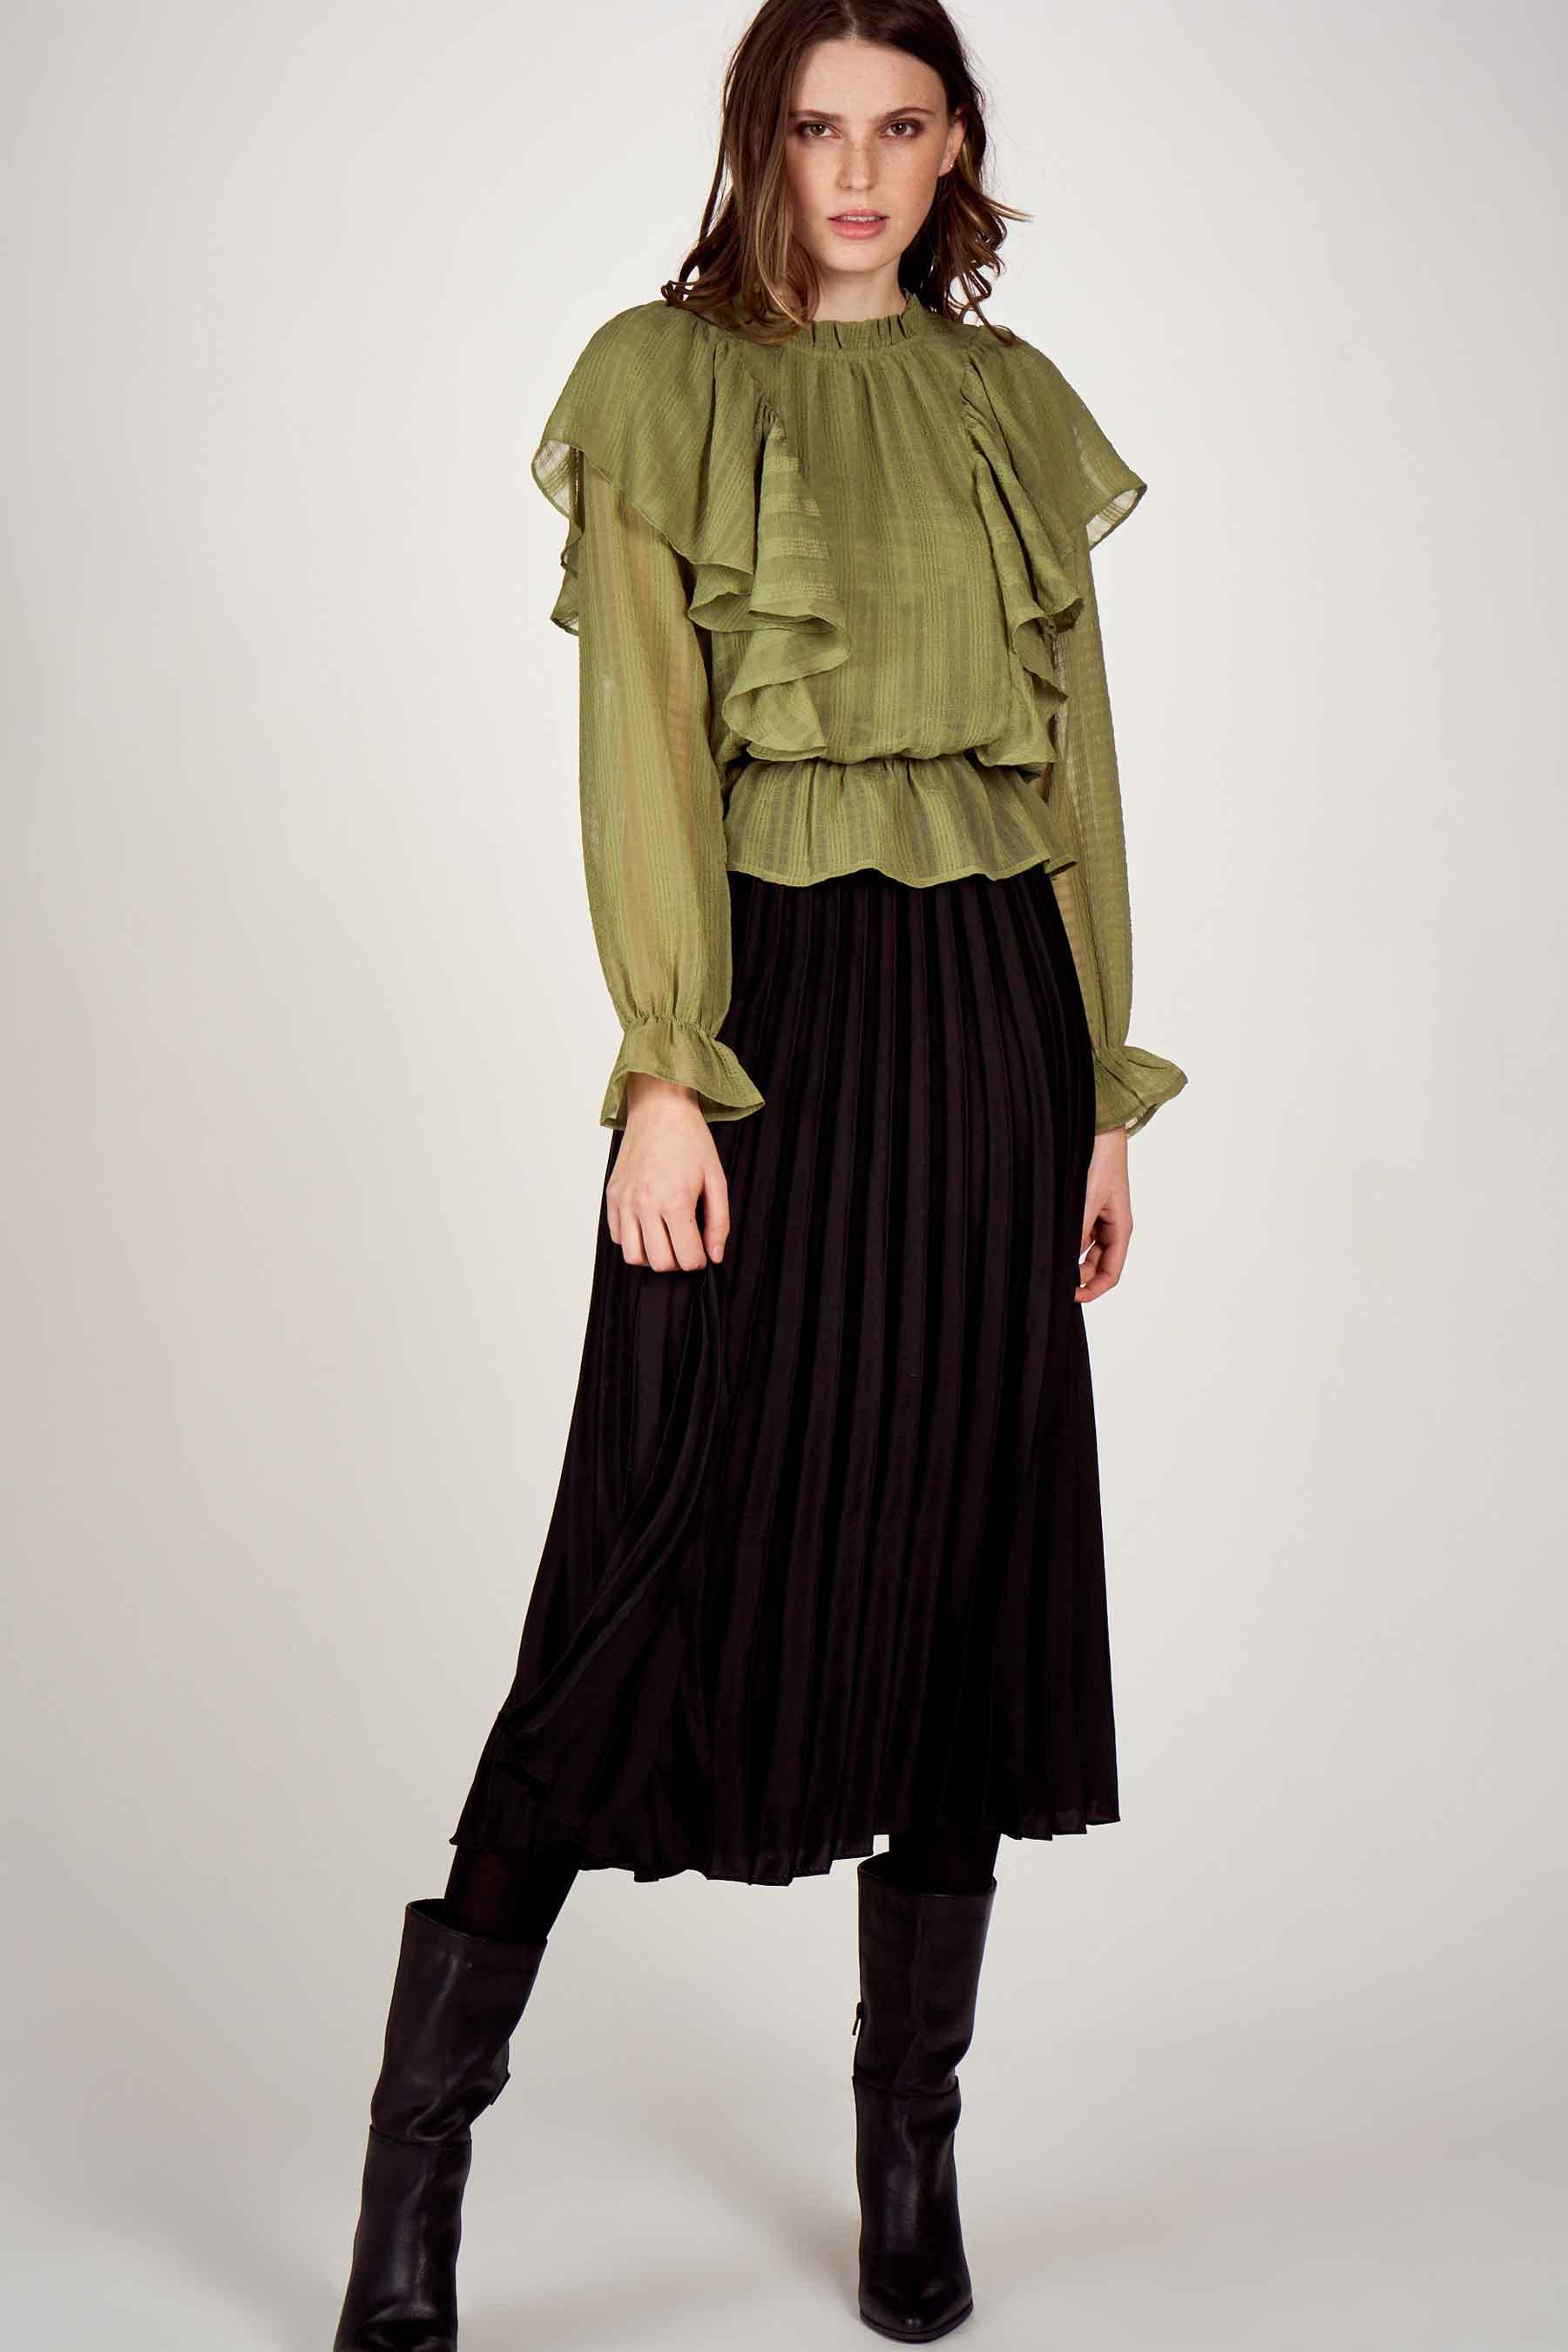 Vero Moda® Blouse lange mouwen, Groen, Dames, Maat: L/M/S/XS